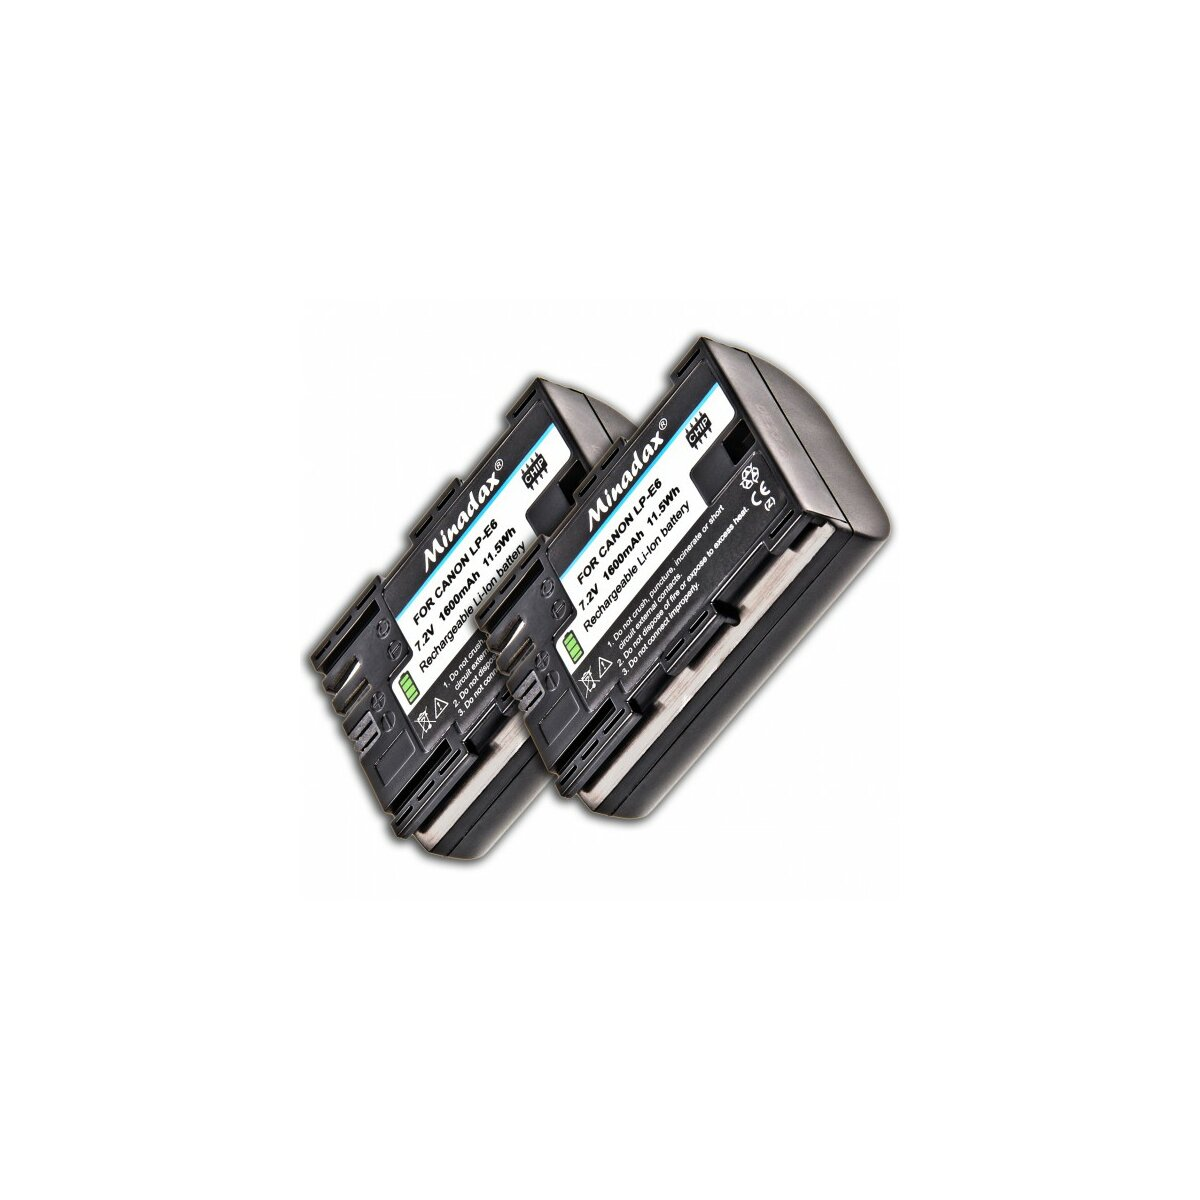 2x Minadax Li-Ion Akku kompatibel mit Canon EOS 80D, 70D, 60D, 7D, 7D Mark II, 6D, 5D Mark IV, 5D Mark III, 5D Mark II - Ersatz für LP-E6 Akku